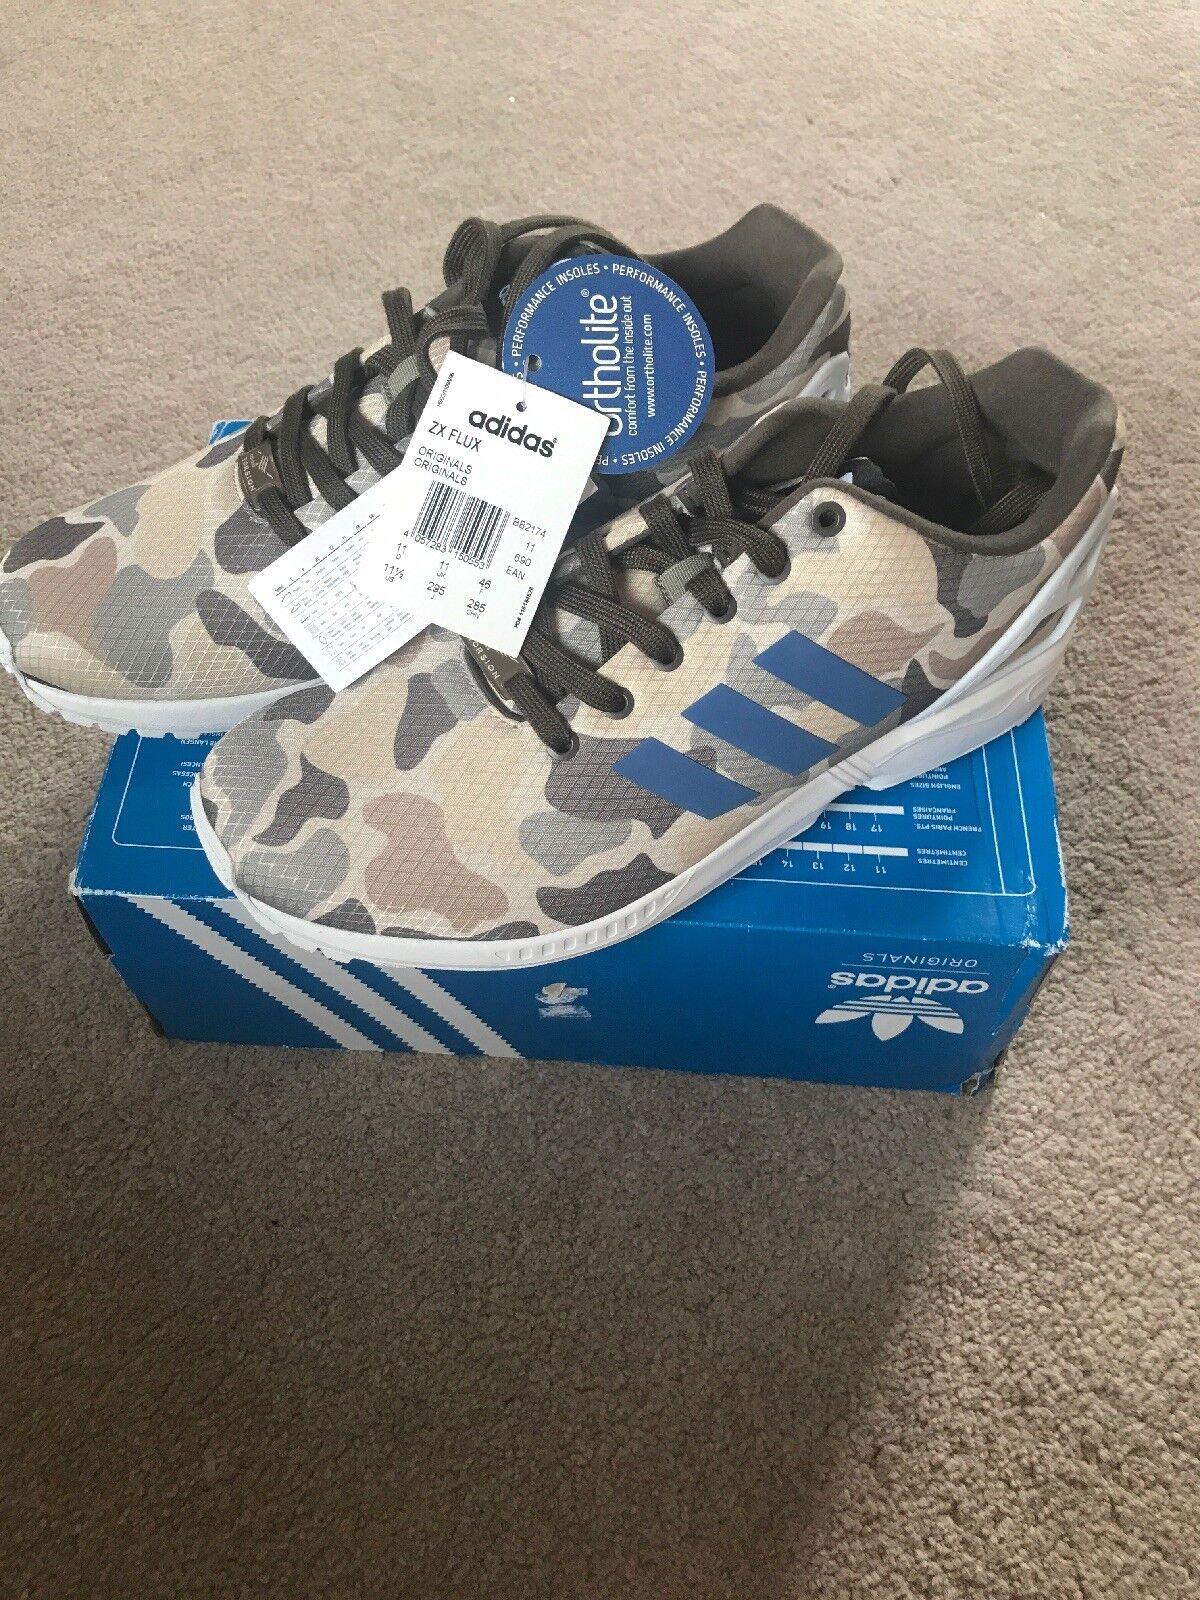 promo code 0f62e ce64f Adidas ZX Flux Trainers, Size 11, 11, 11, Brand New, BB2174 99ceb0